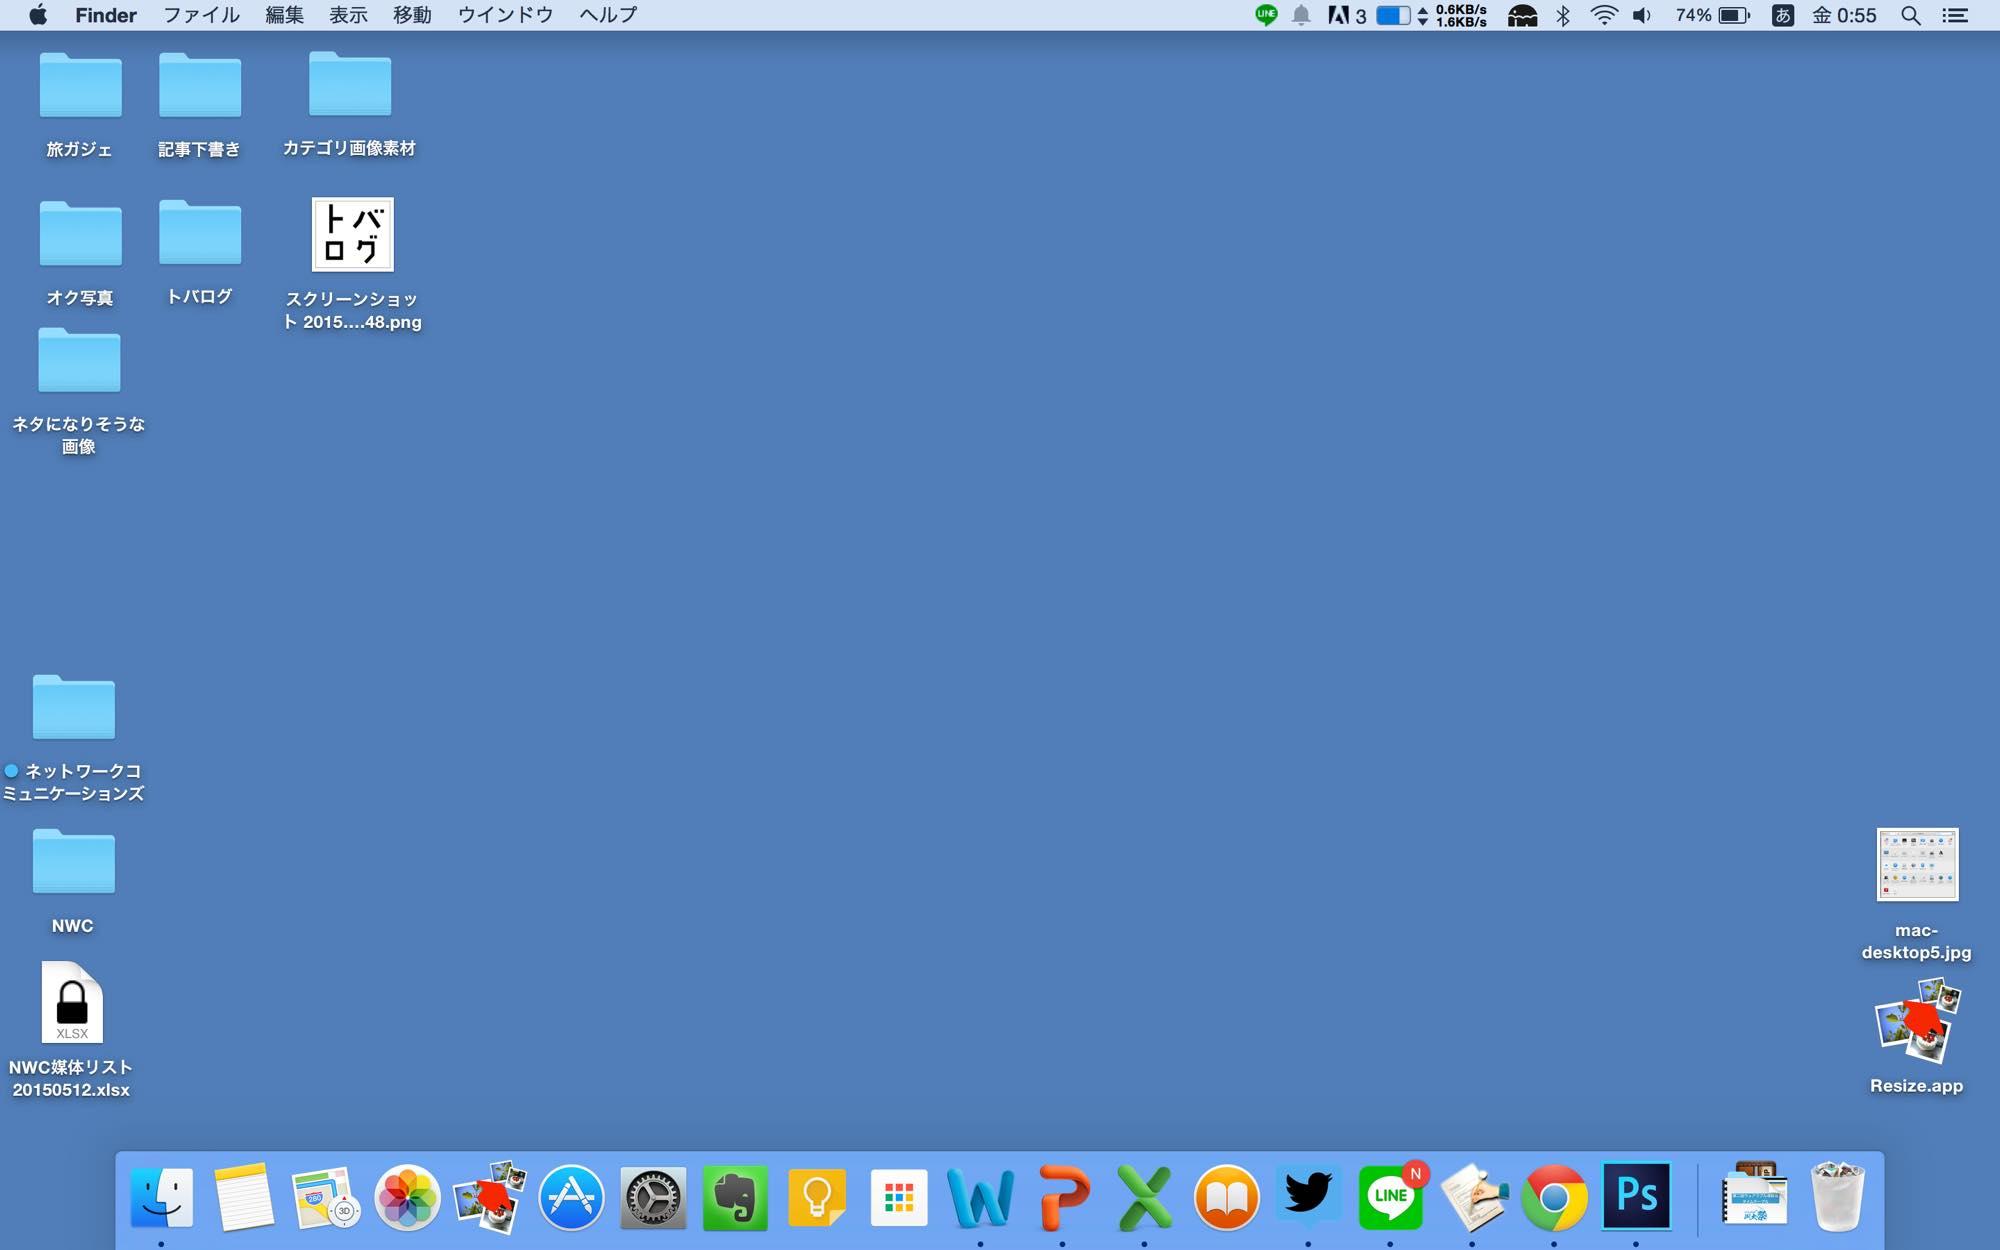 Mac デスクトップの壁紙を毎日自動でリフレッシュさせる方法 壁紙を変えて心もリフレッシュ